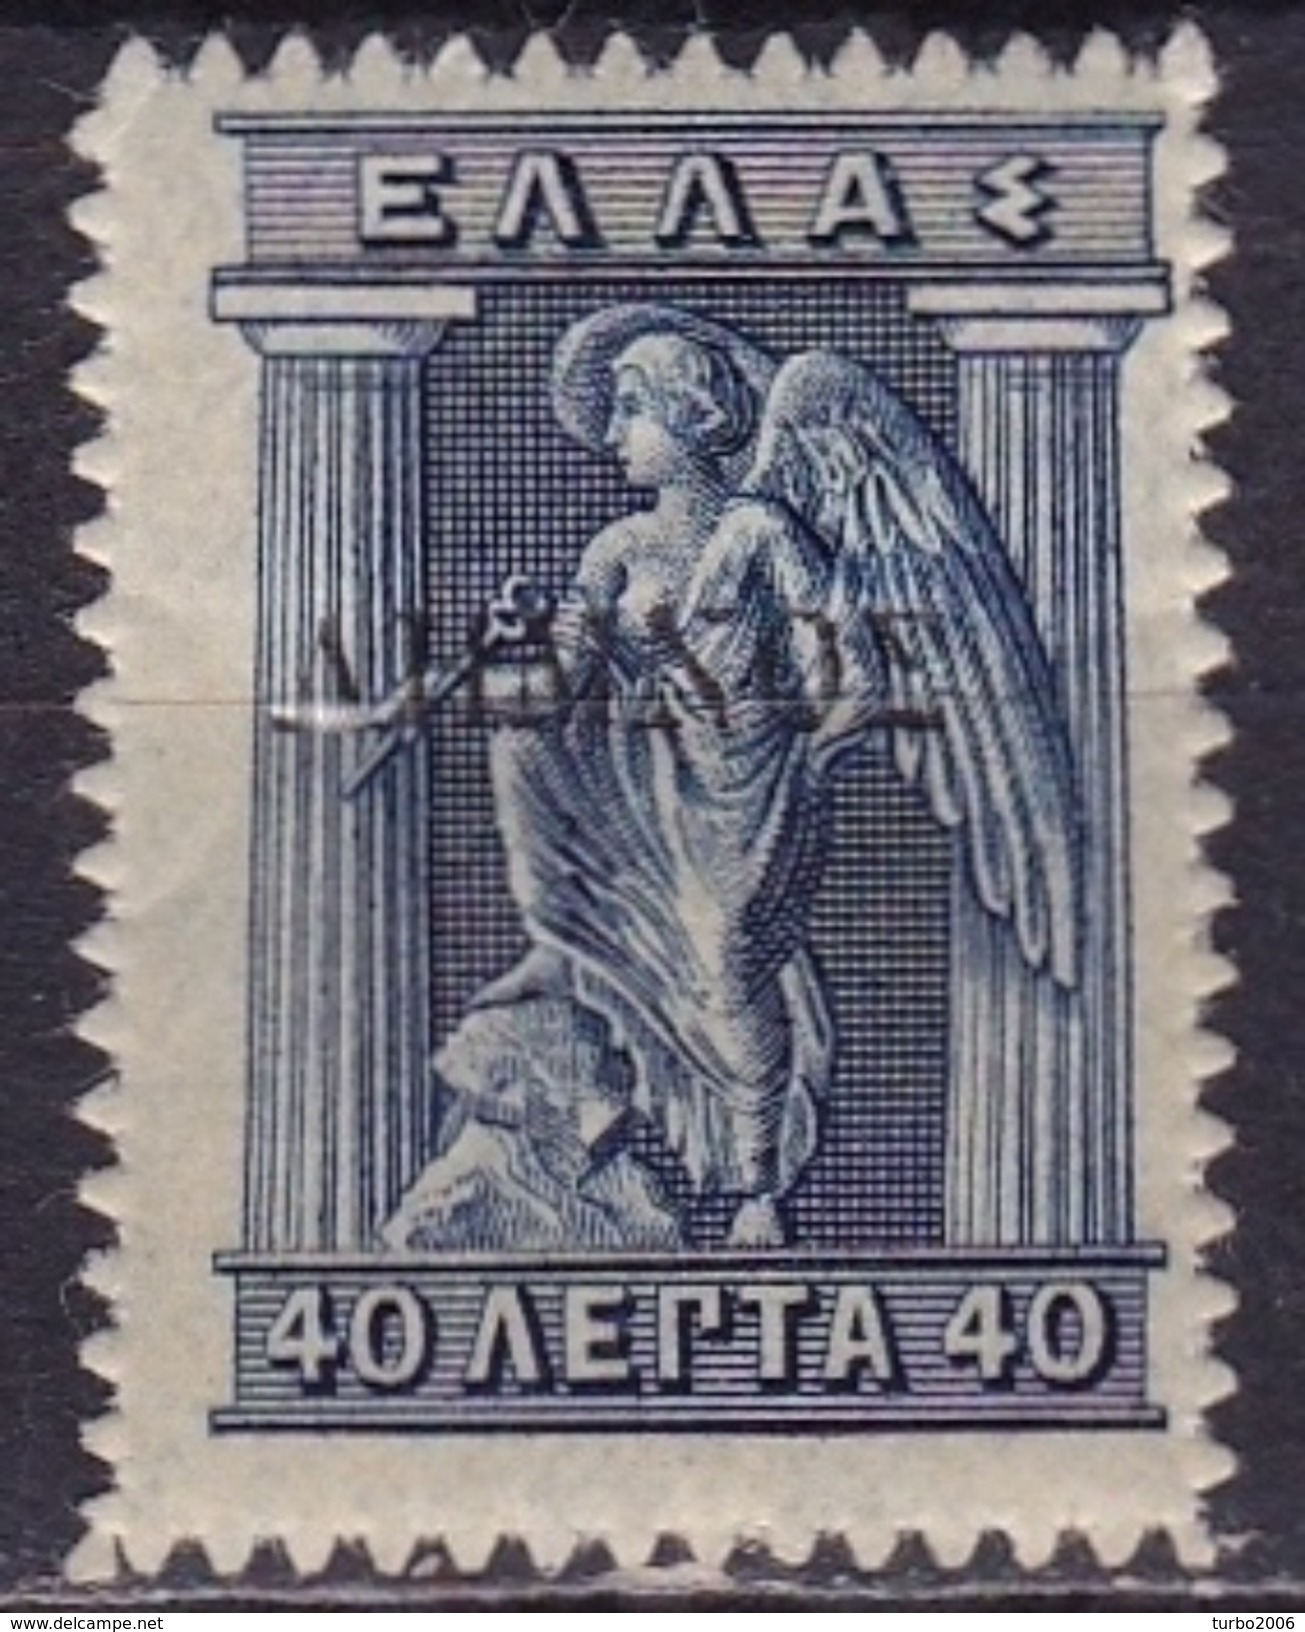 LEMNOS 1912 40 L Blue Engraved With Black Overprint Lemnos Vl. 15 MH - Lemnos